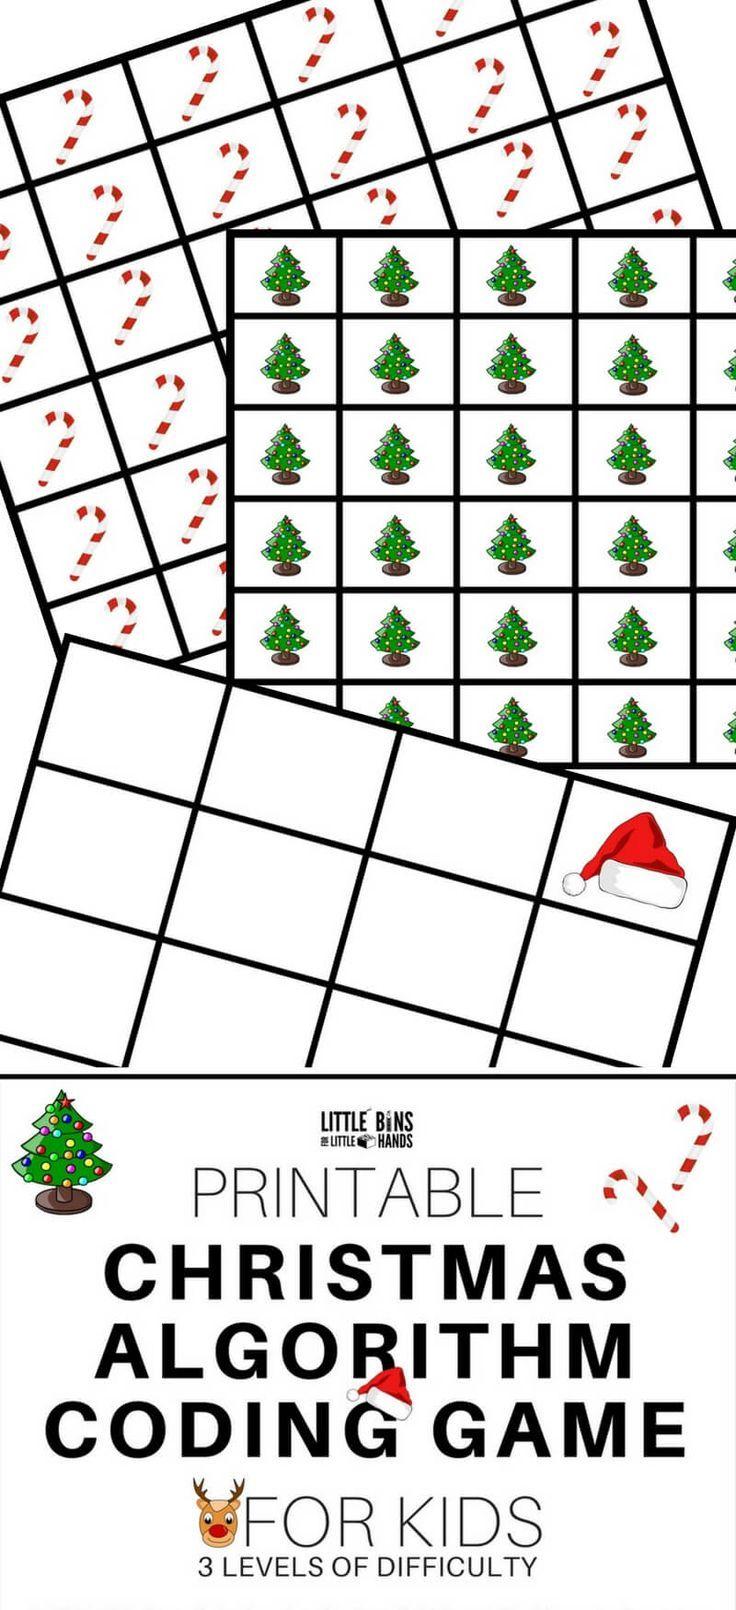 Free Printable Christmas Coding Stem Activity Game For Kids Christmas Stem Activities Coding For Kids Activity Games For Kids [ 1610 x 736 Pixel ]